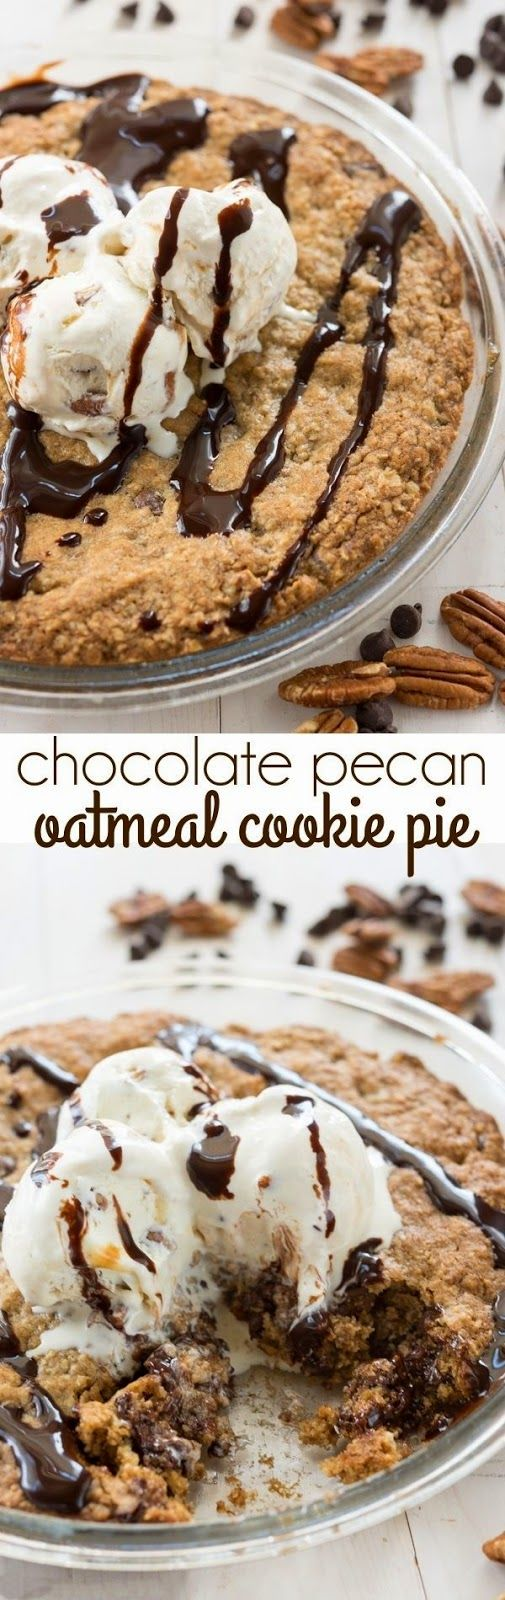 Chocolate Pecan Oatmeal Cookie Pie